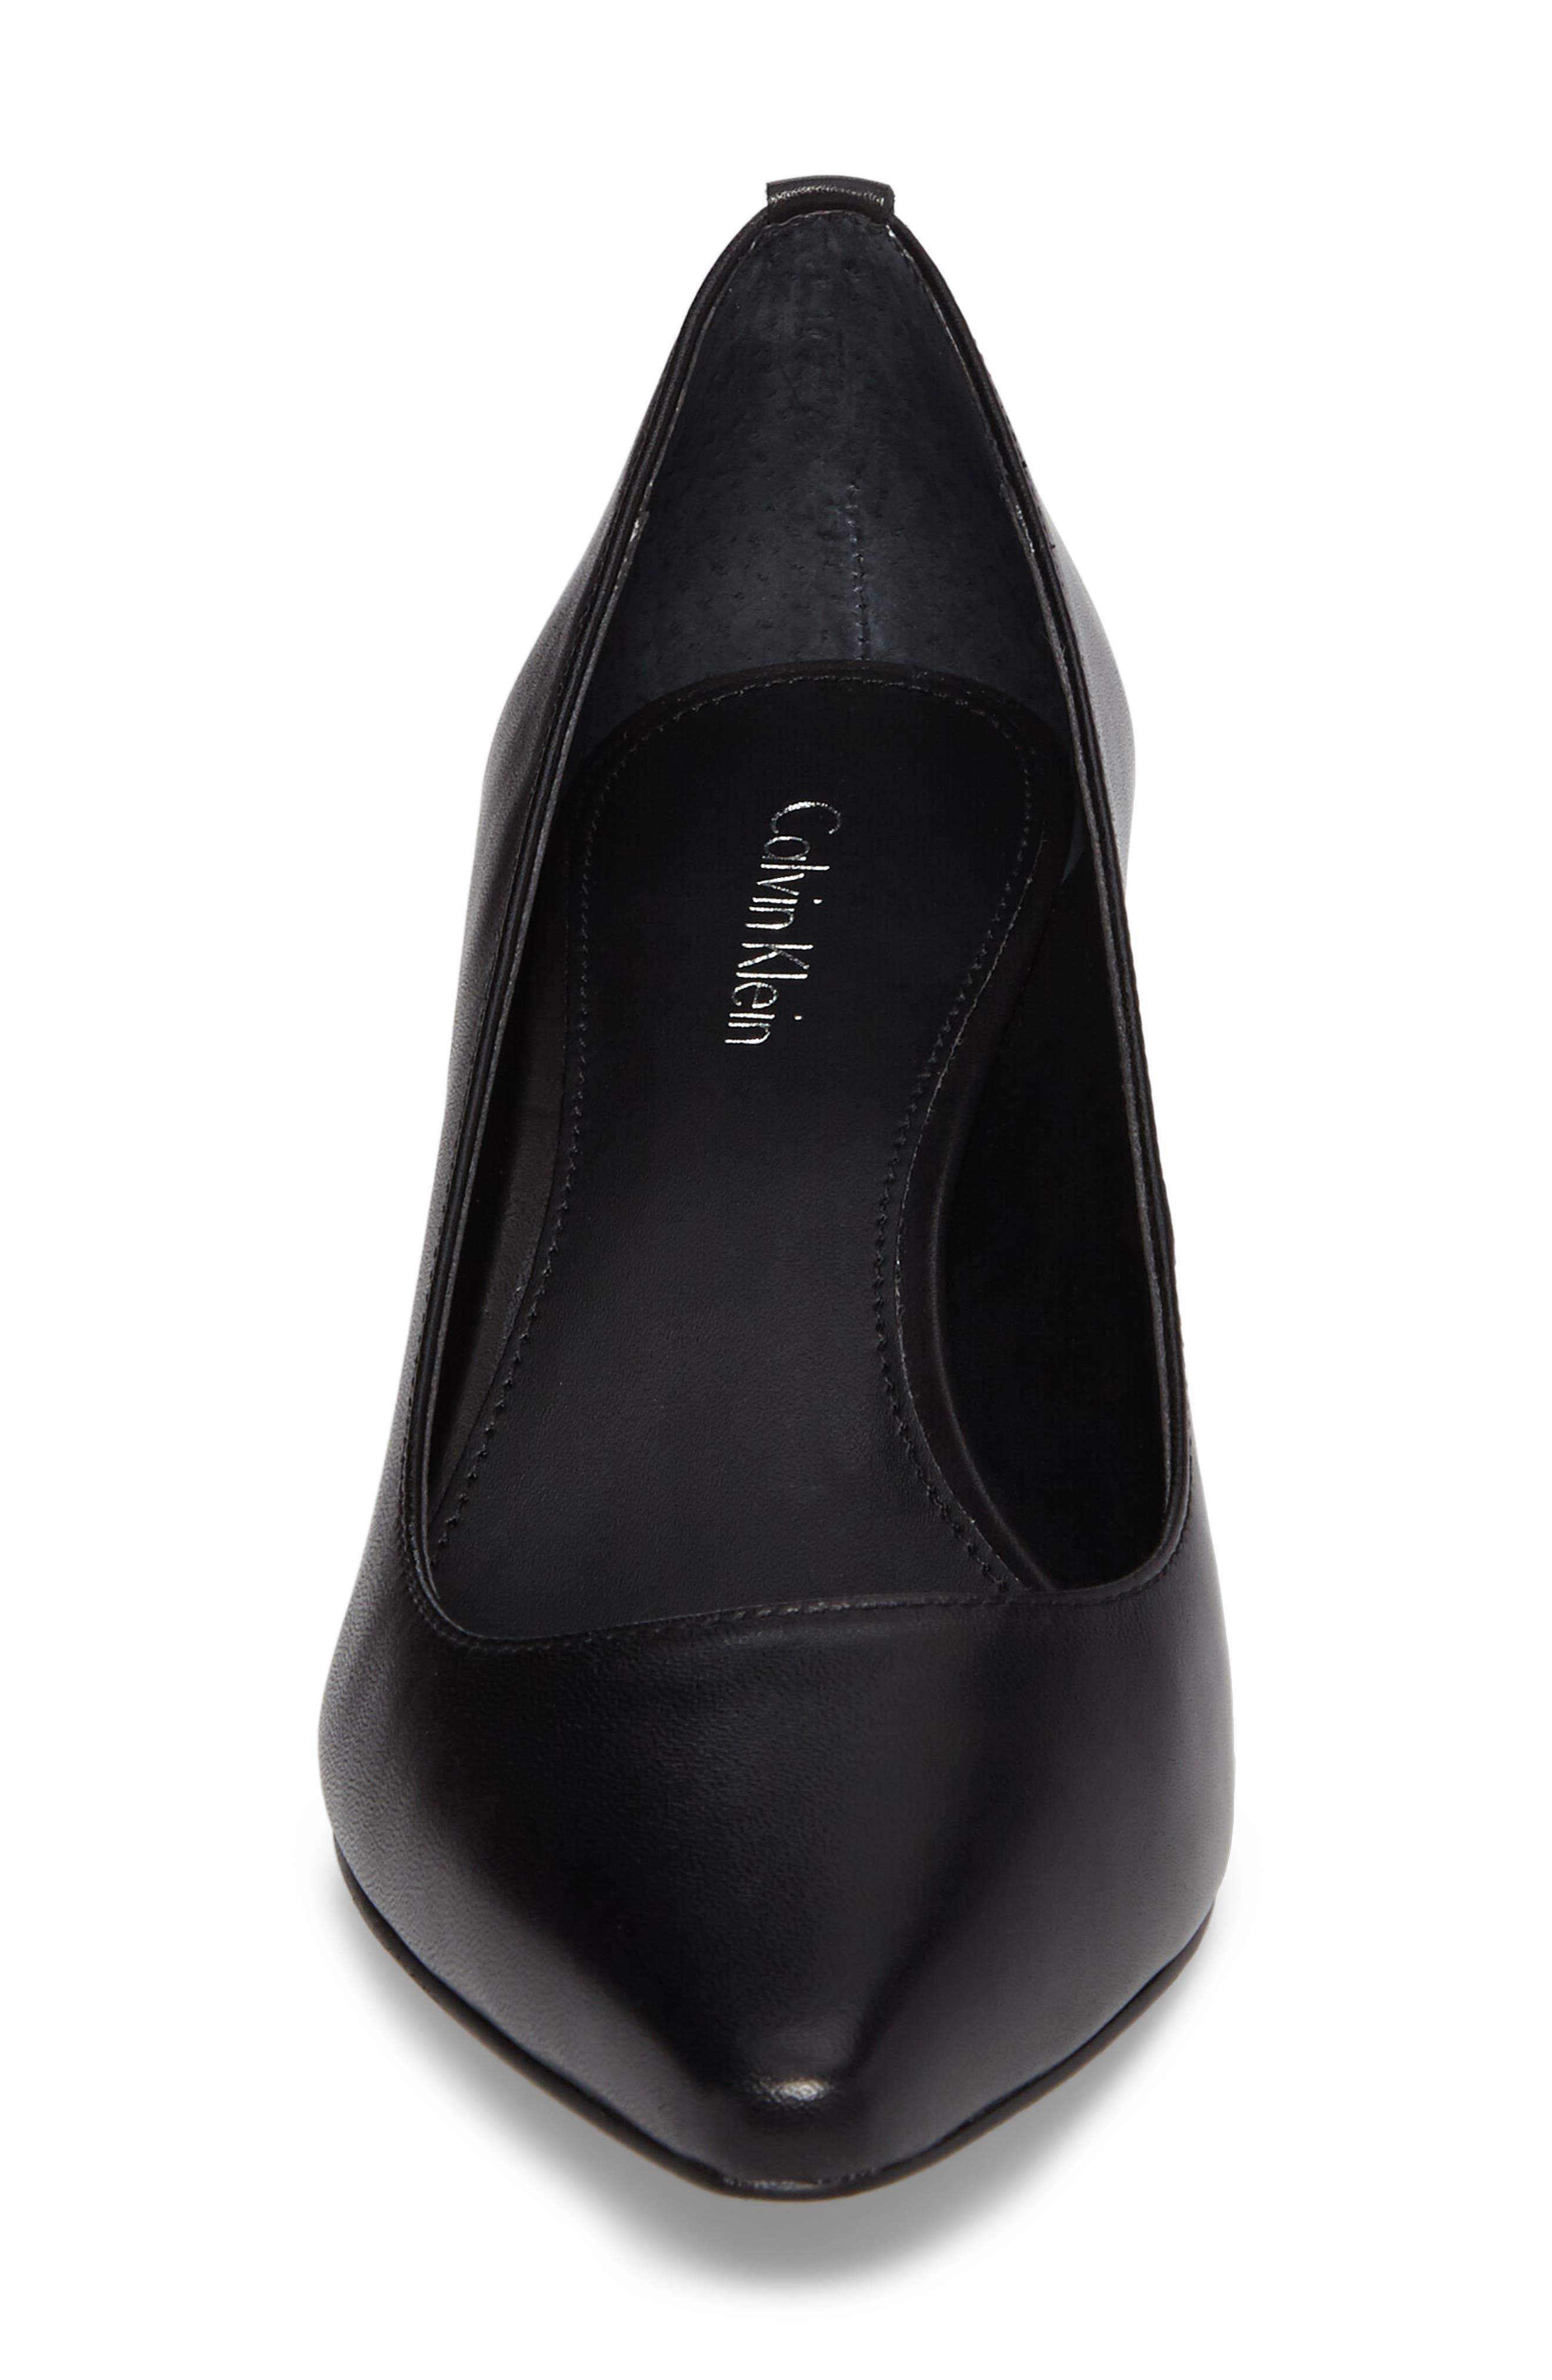 Natalynn 2 Texture Heel Pump,                             Alternate thumbnail 4, color,                             Black